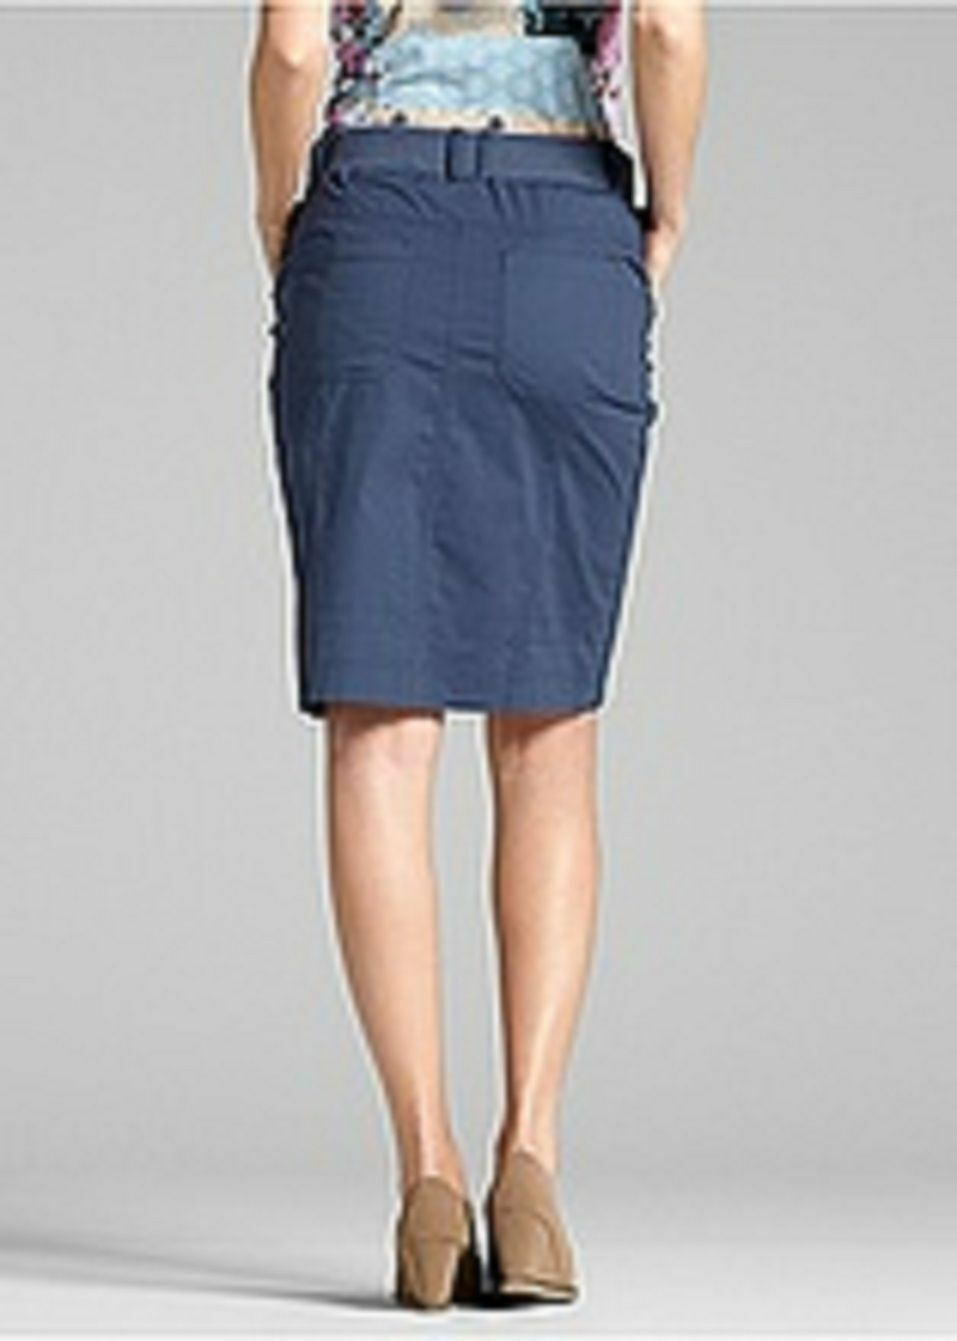 34 36 38 42 394189 Damen Bleistiftrock Rock kurz Skirt Stretch blau schwarz Gr